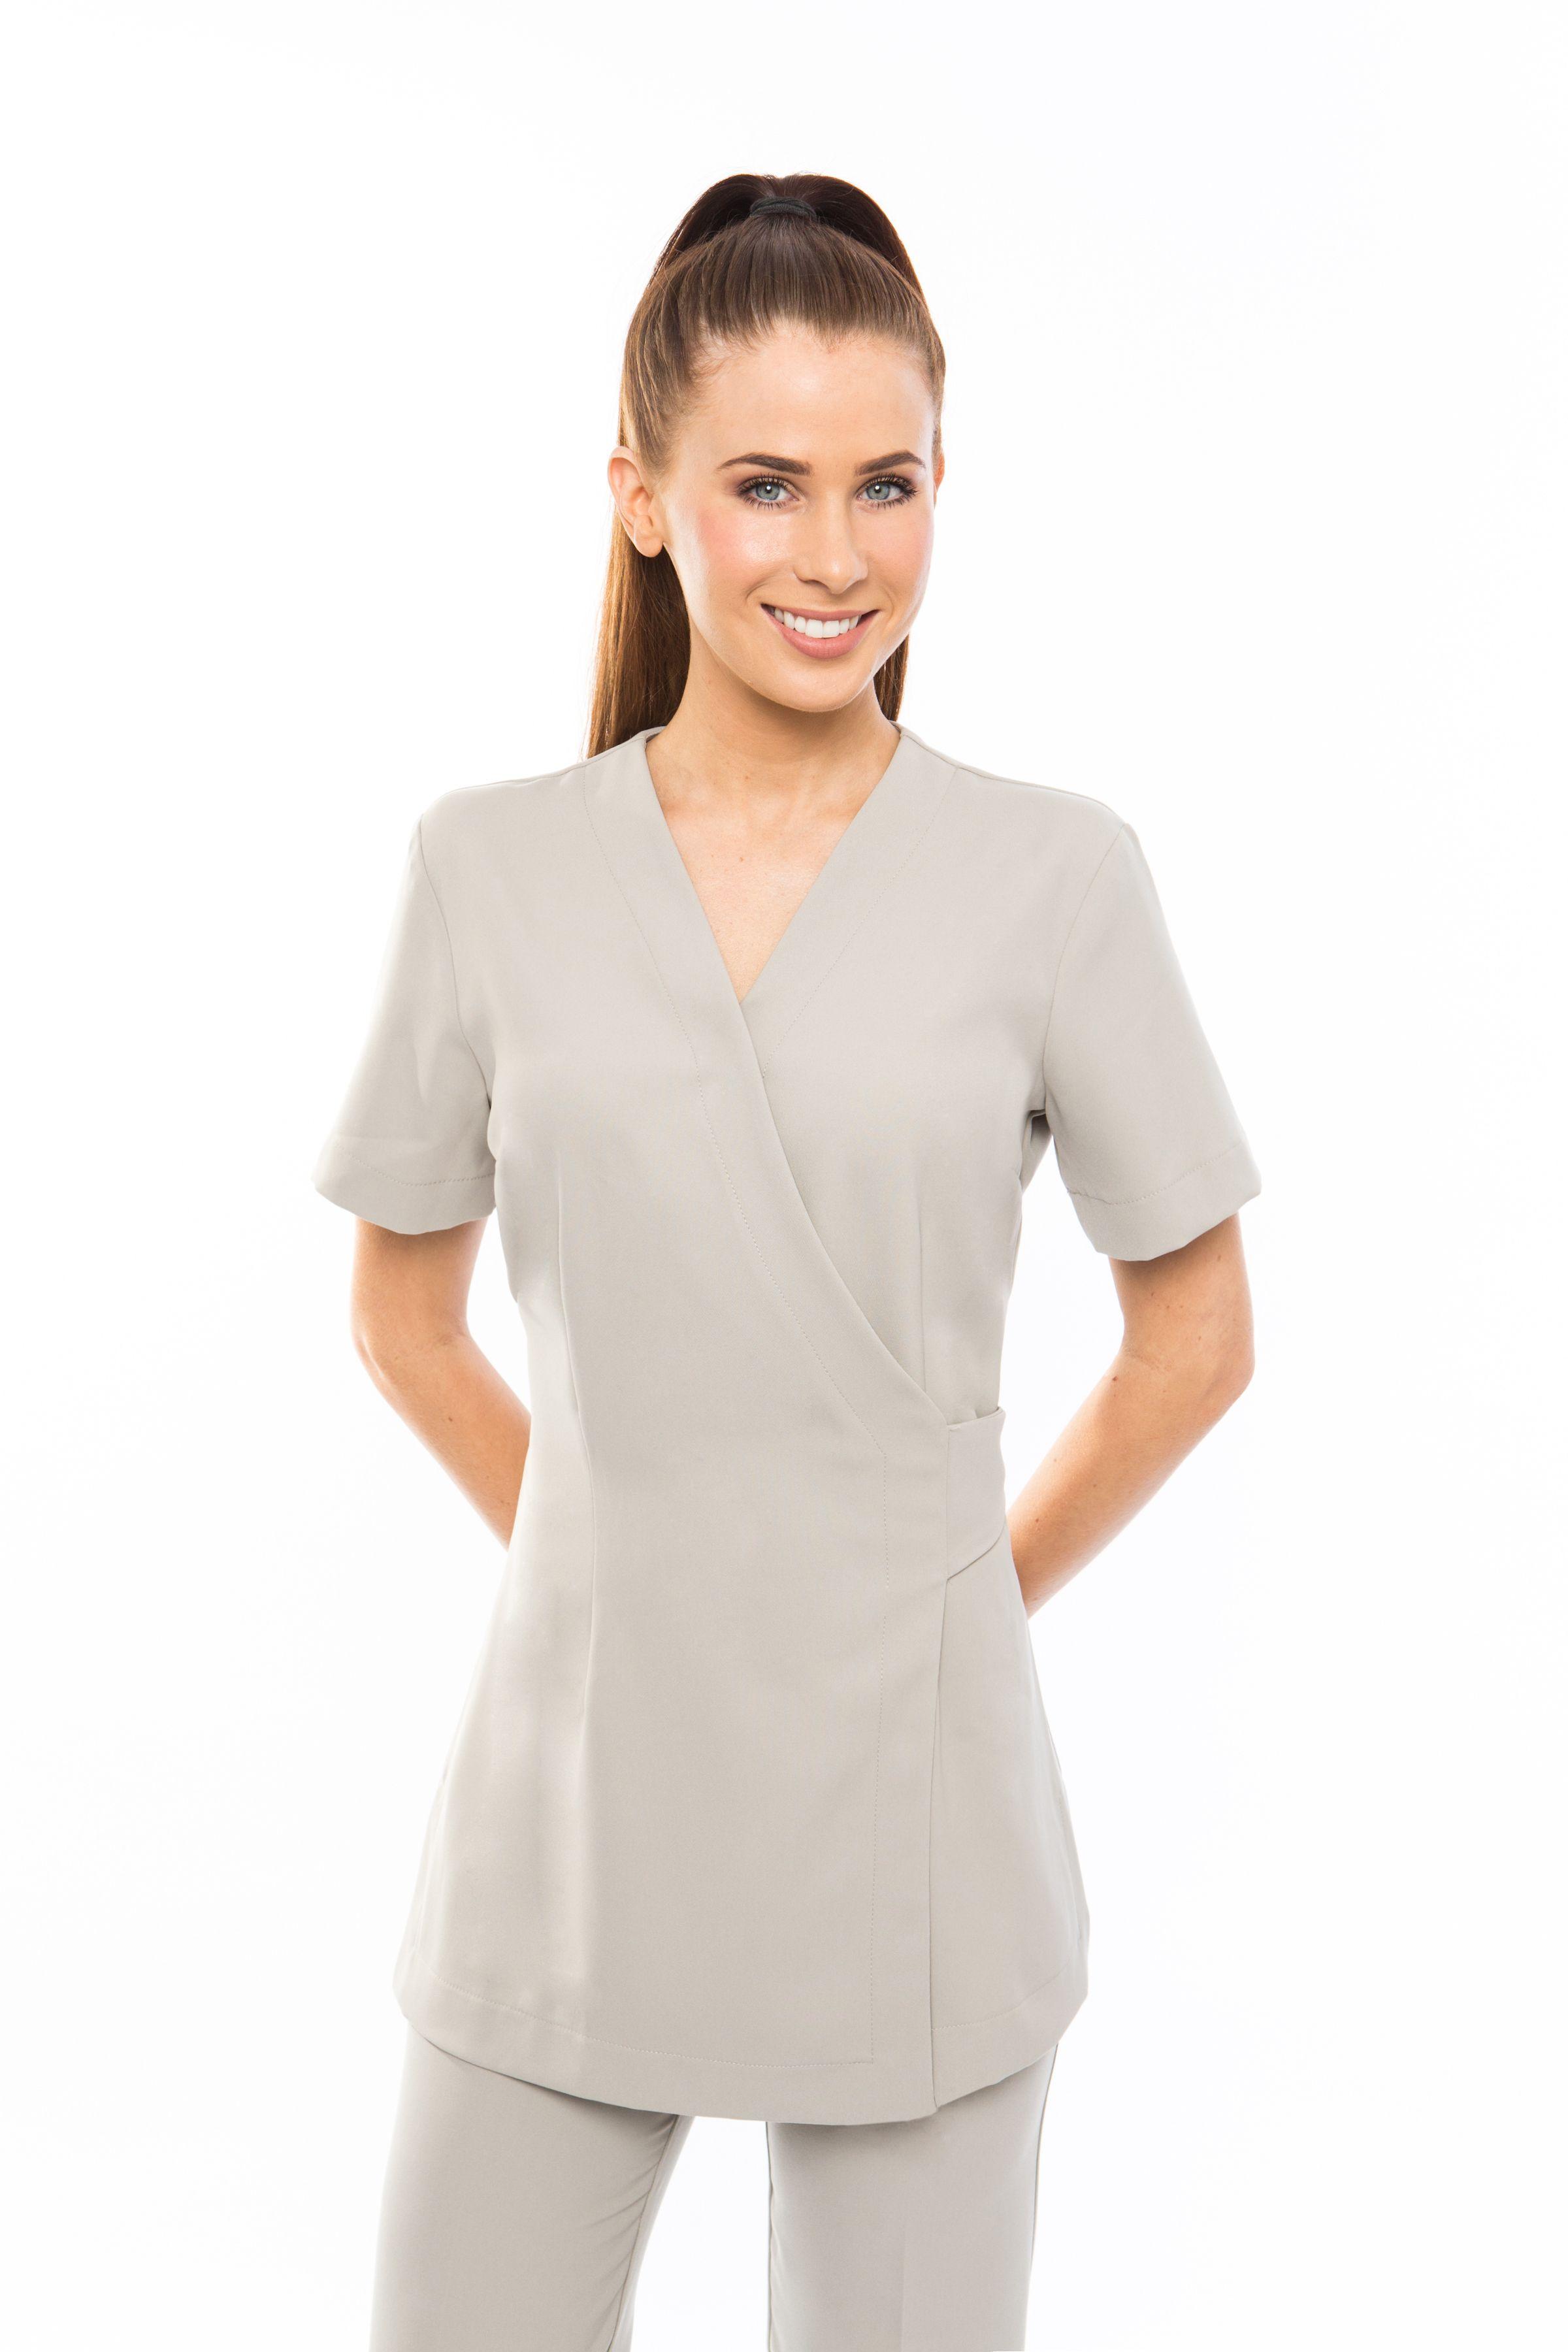 Uniforms for Spa & Medical Centres